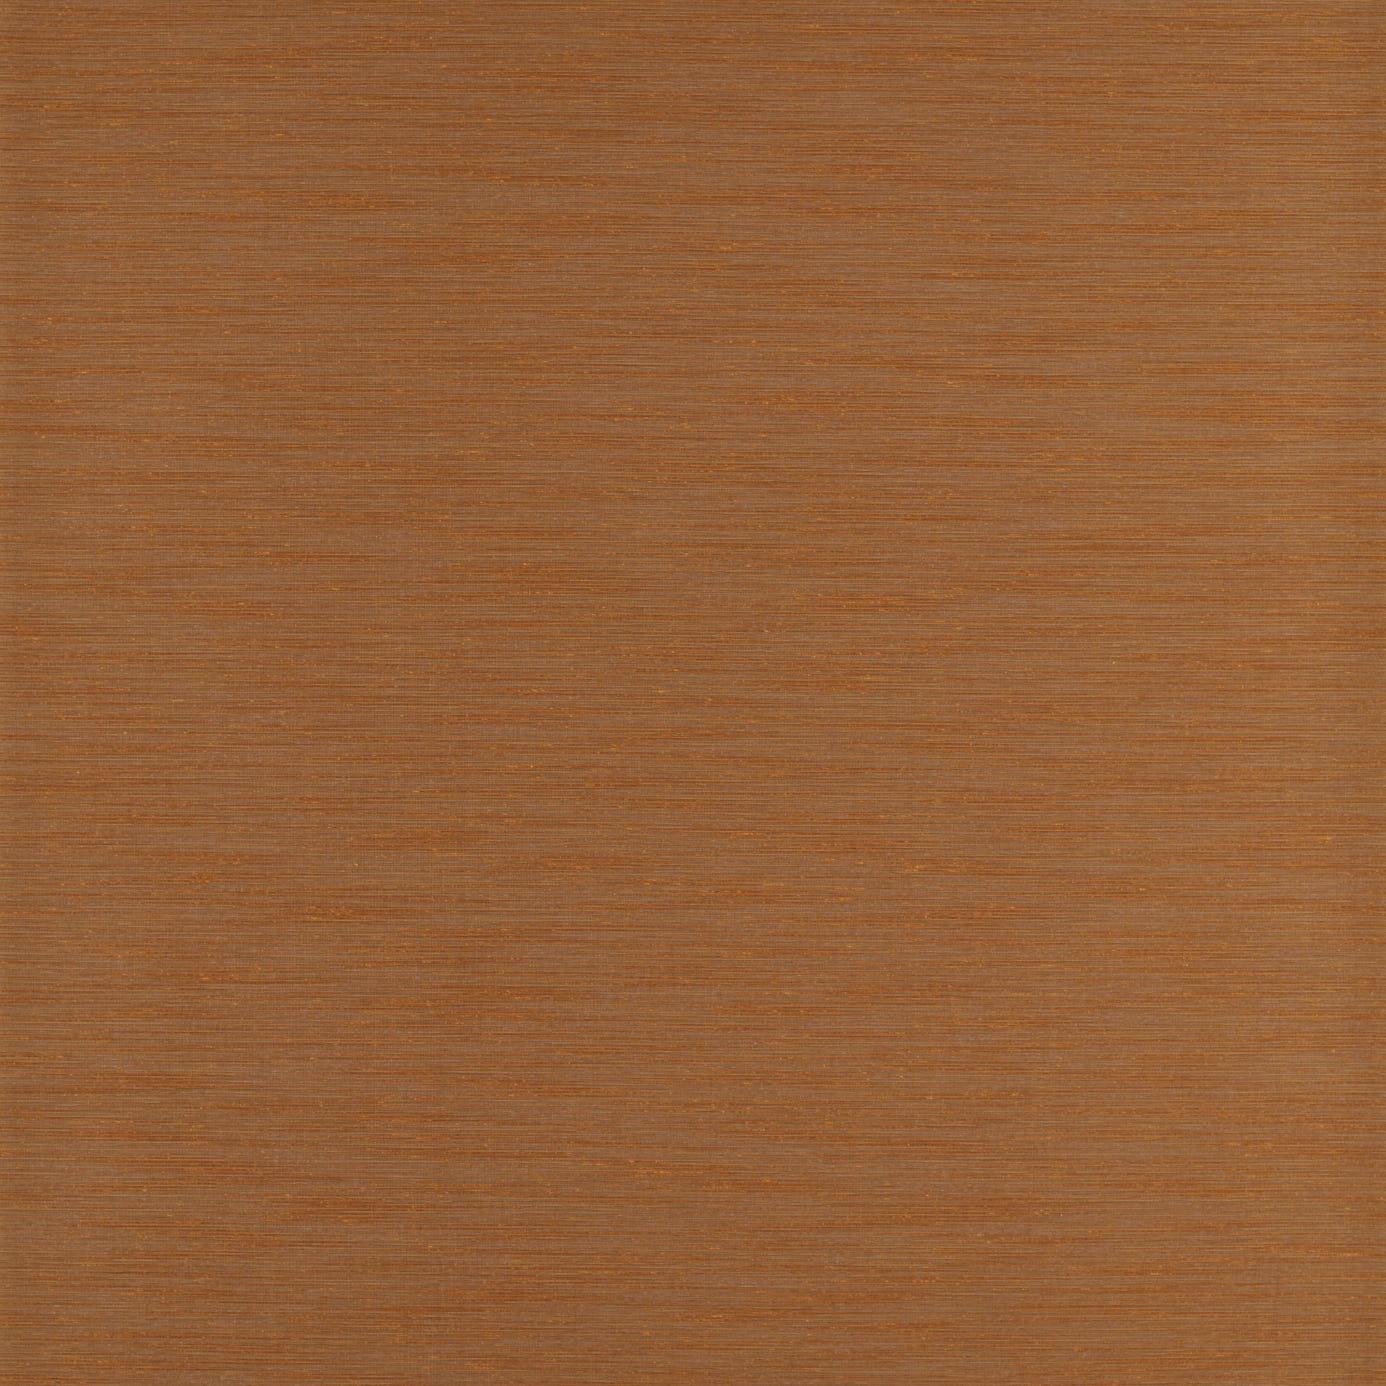 Английские обои Zoffany,  коллекция Akaishi, артикул312490